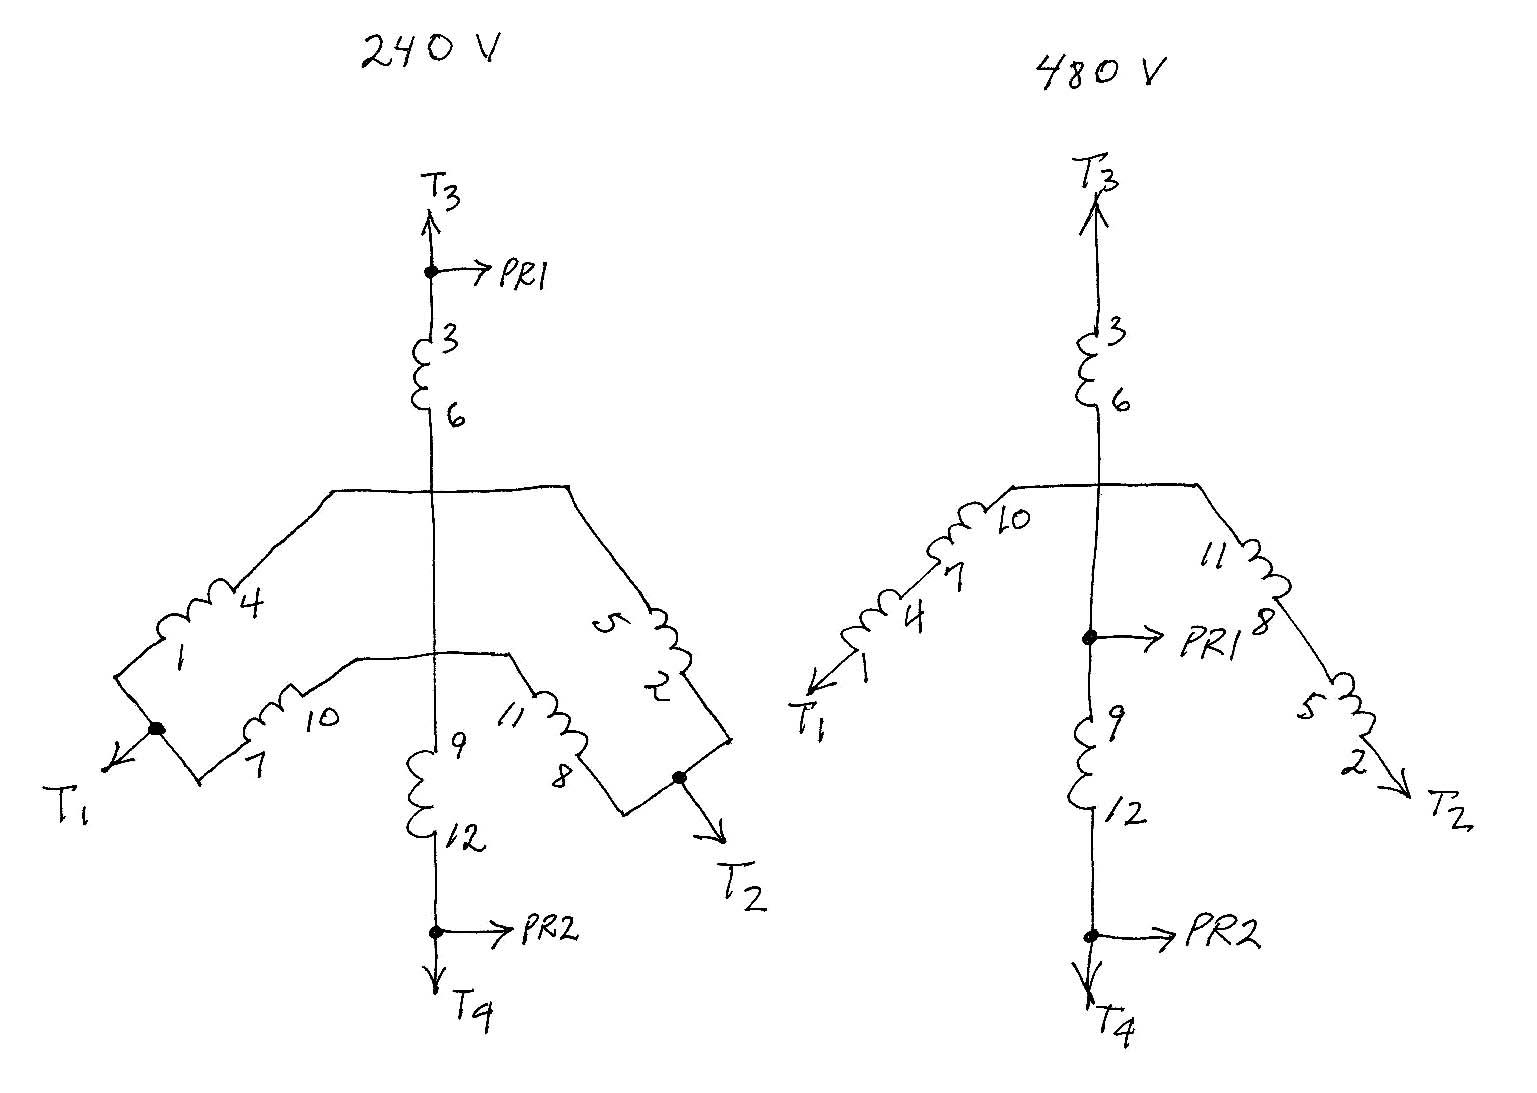 three phase motor winding diagram vauxhall vectra c radio wiring 2 sd single ac